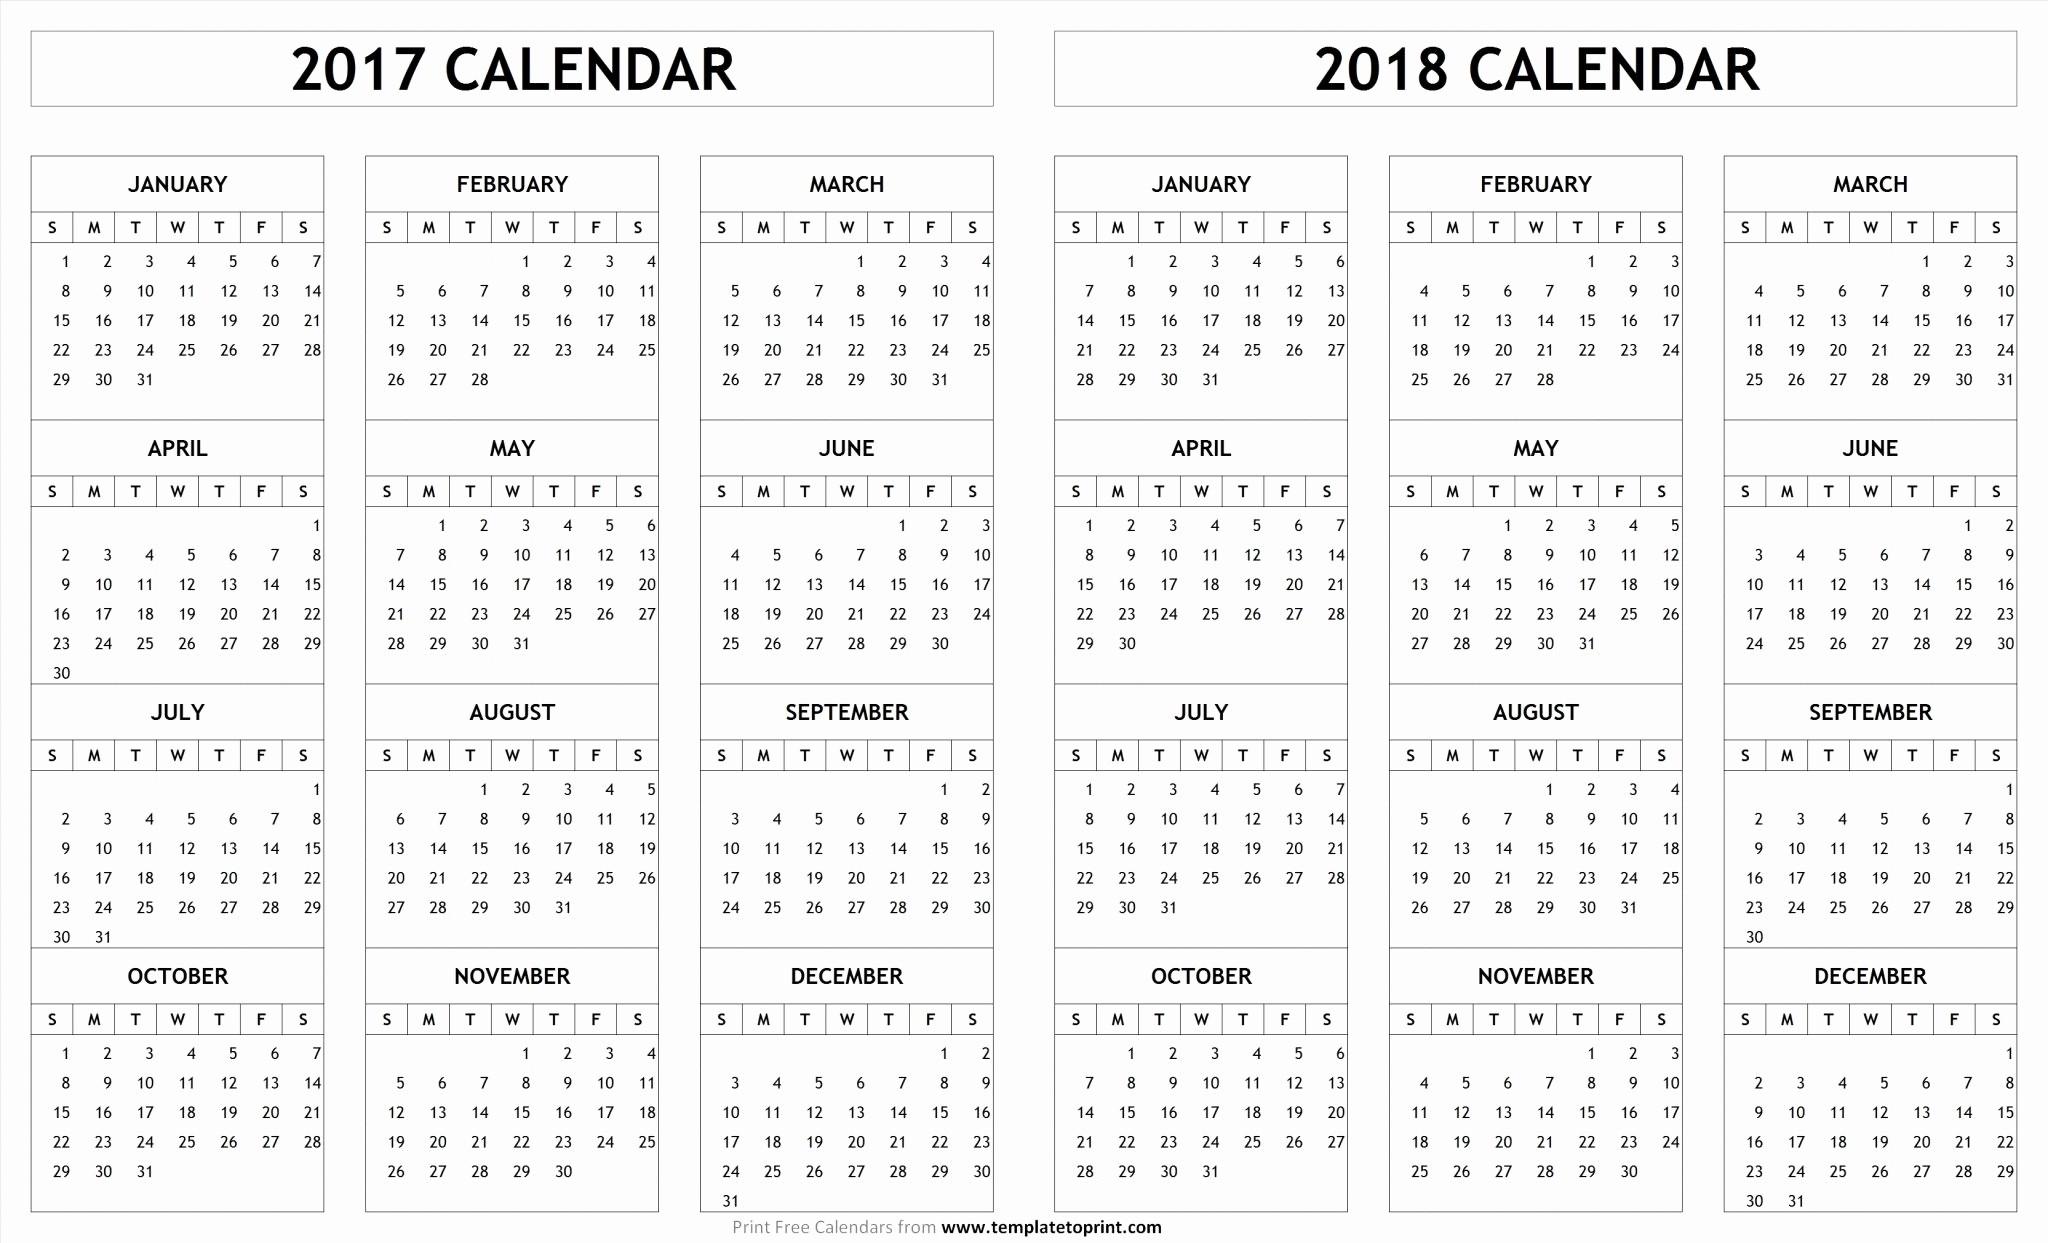 Calendar Uga 2017-2018 Printed For Free – Calendaro.download for 2019- 2020 Calendar Printable Uga